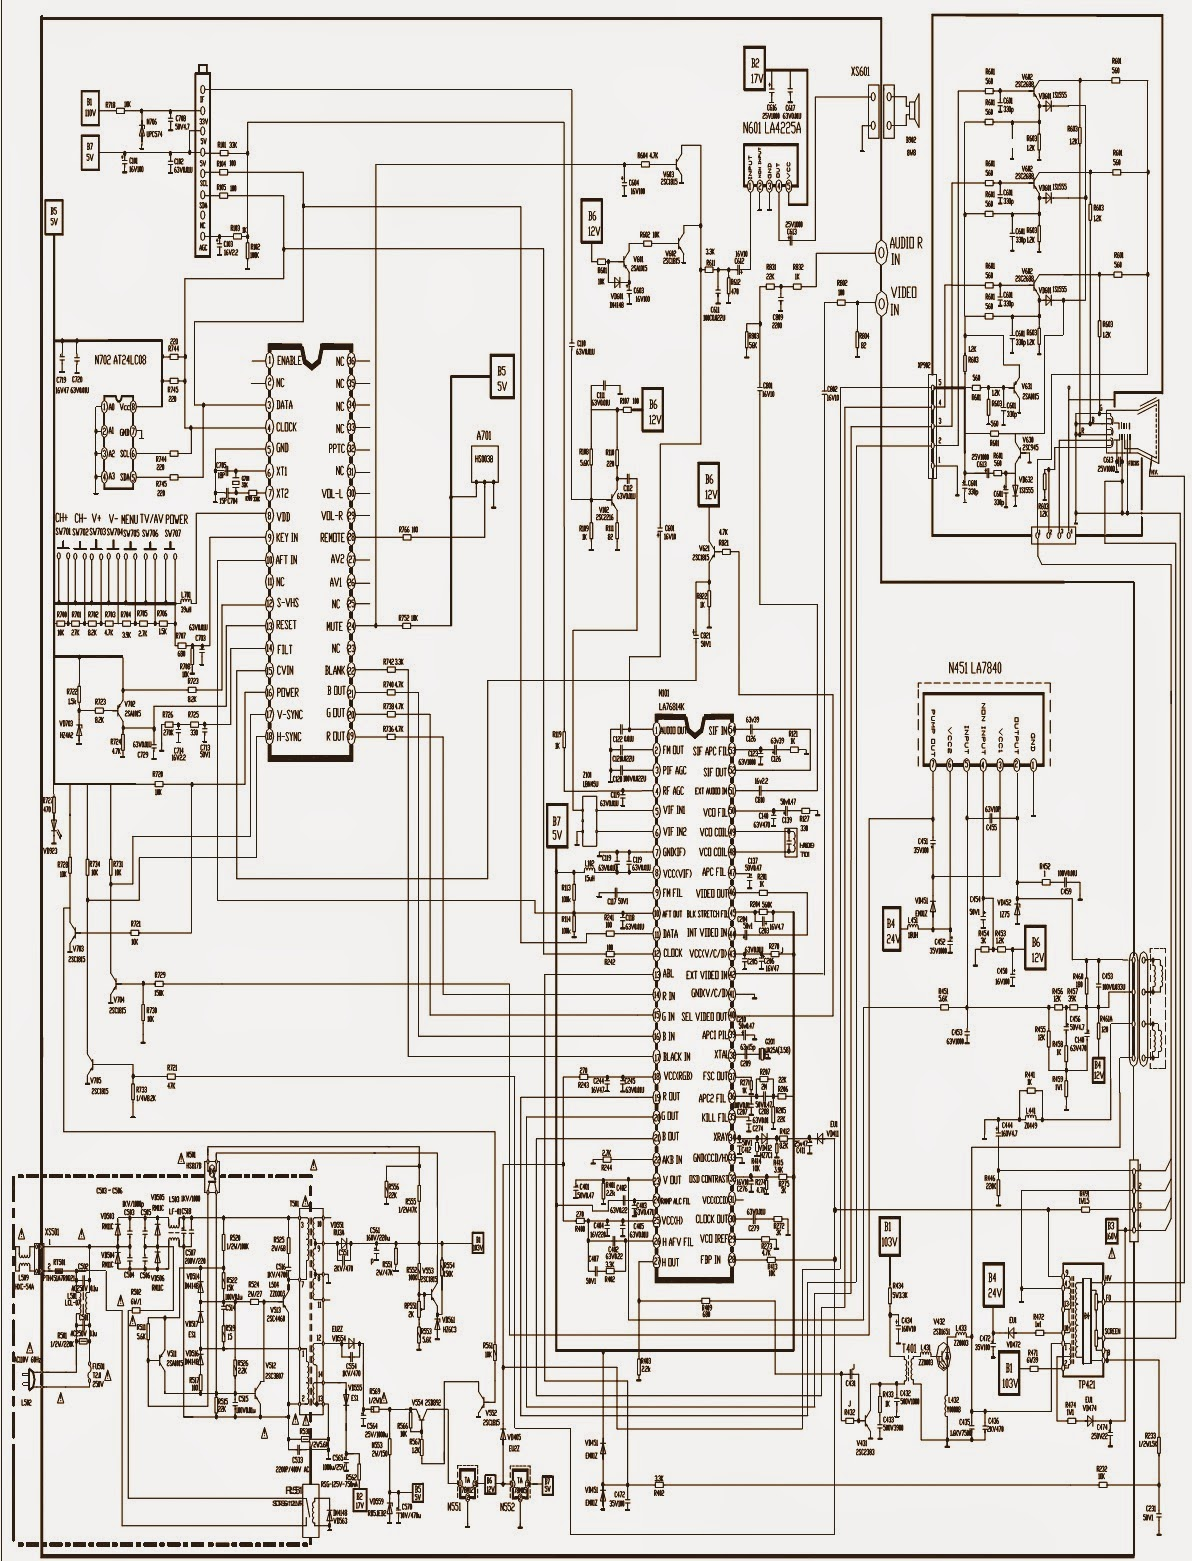 medium resolution of kenworth fuse box diagram 2000 kenworth w900 fuse diagram kenworth w900 fuse box diagram on 2003